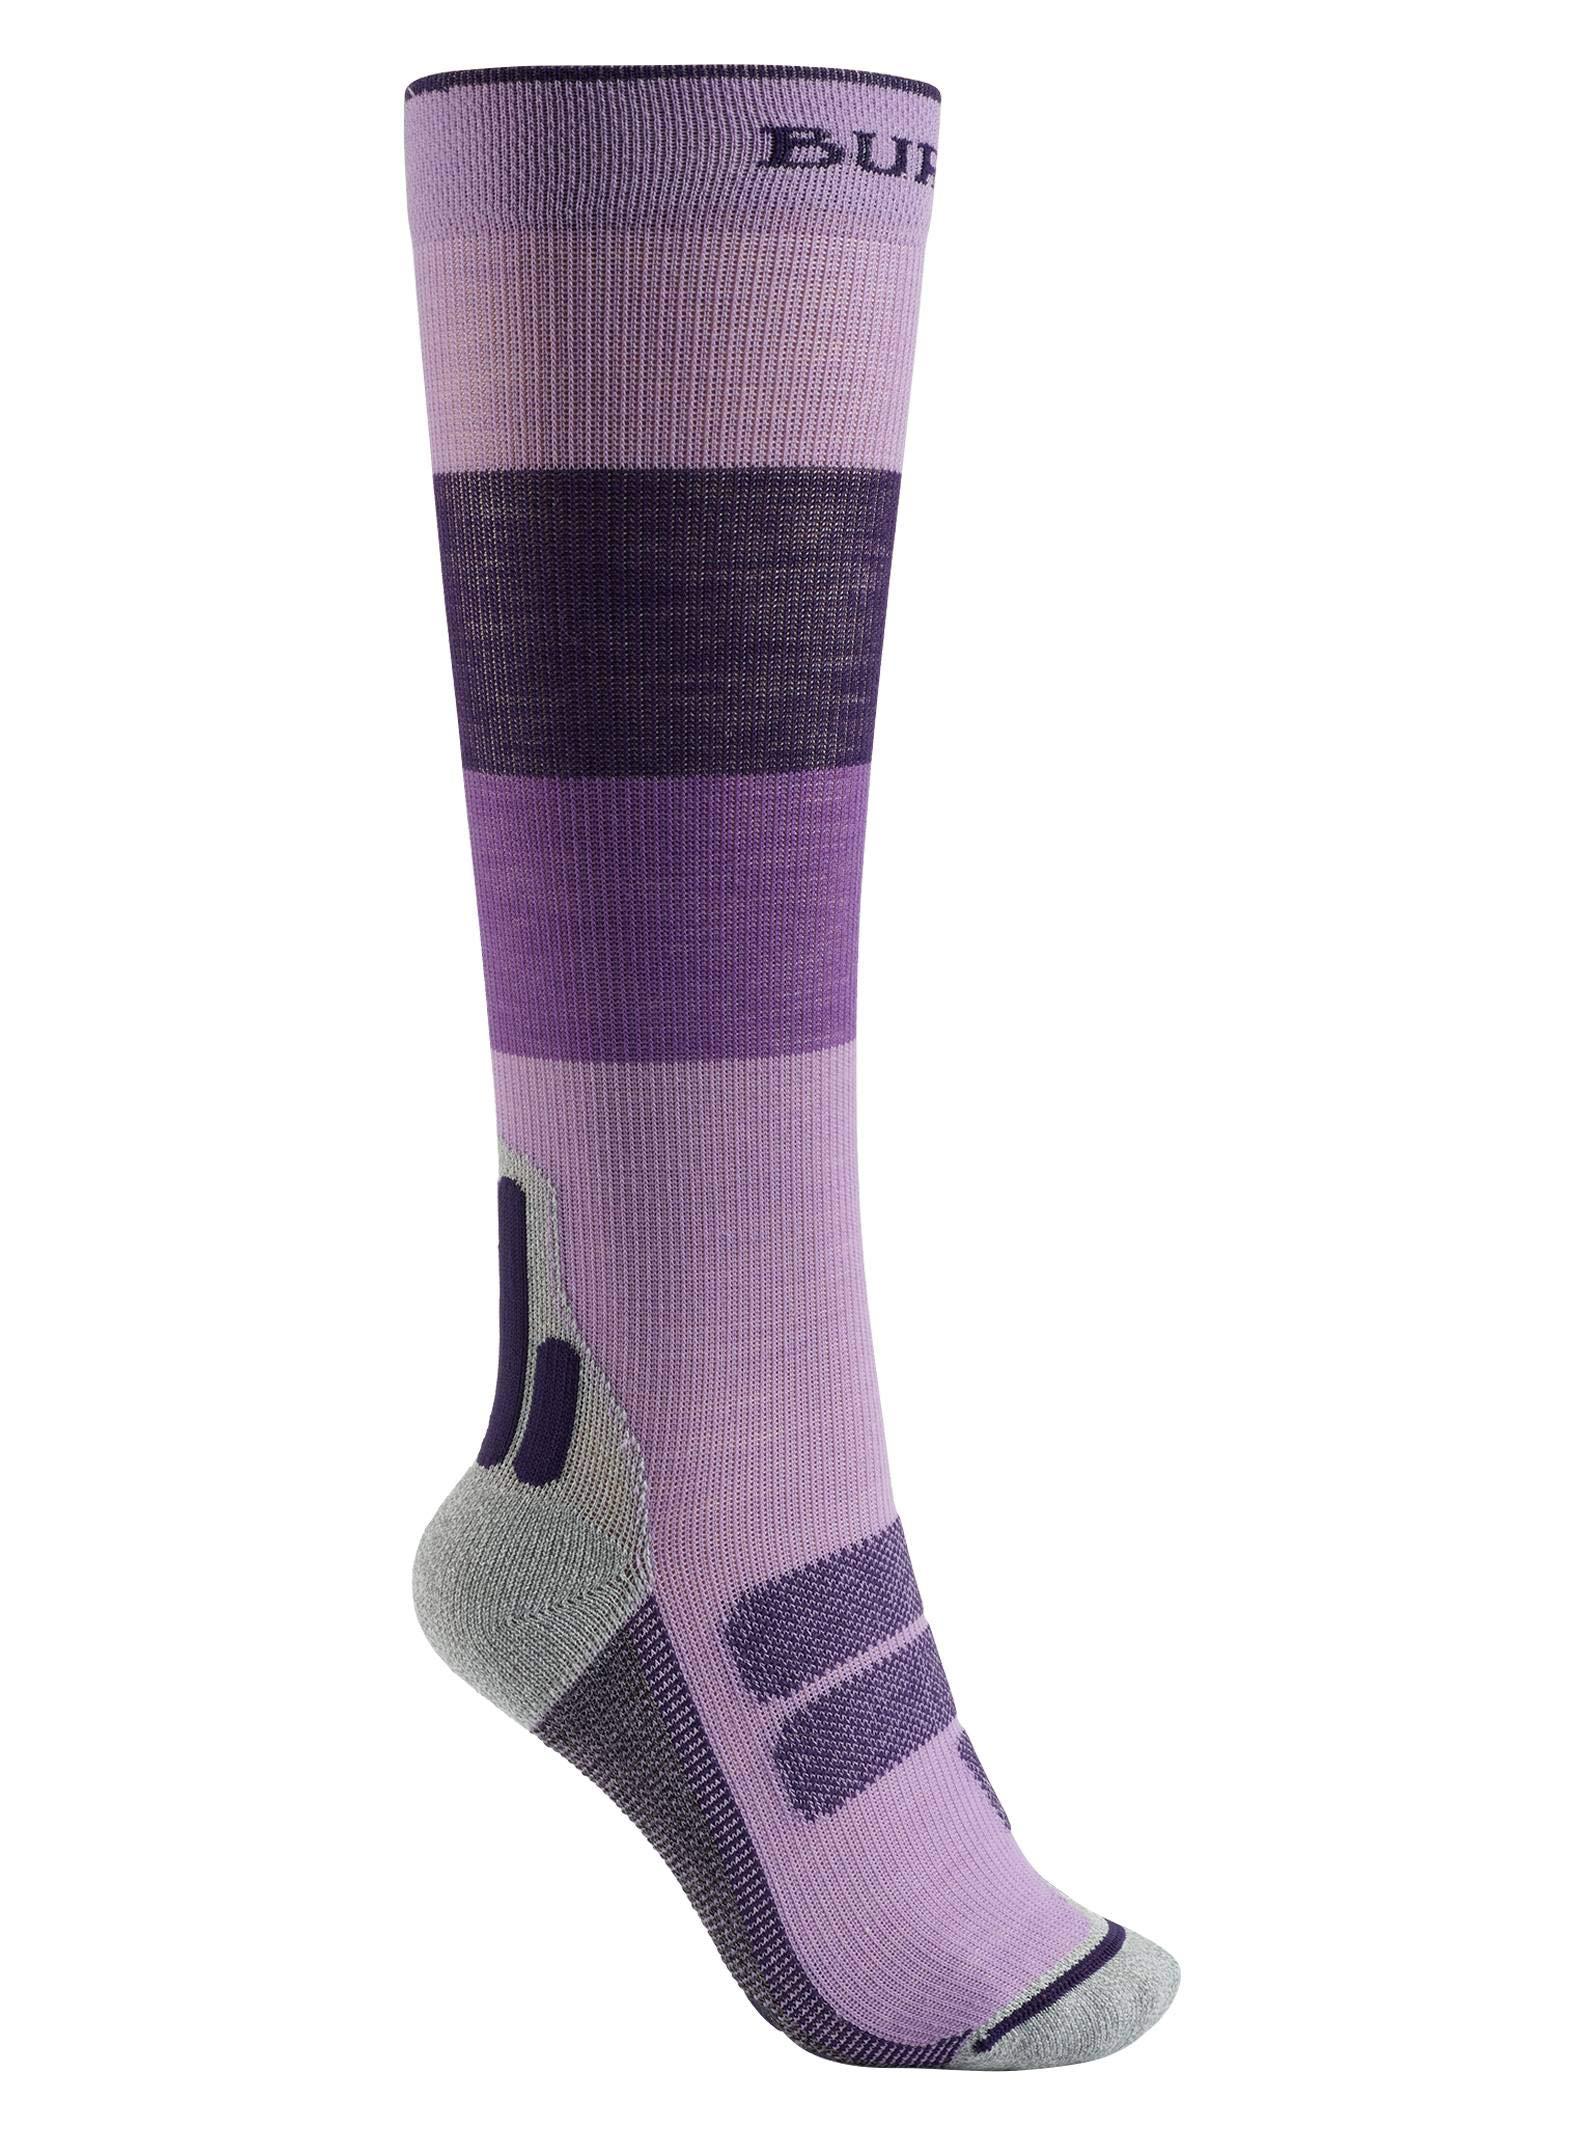 Burton Women's Performance + Ultralight Compression Sock, Concord Block, Medium by Burton